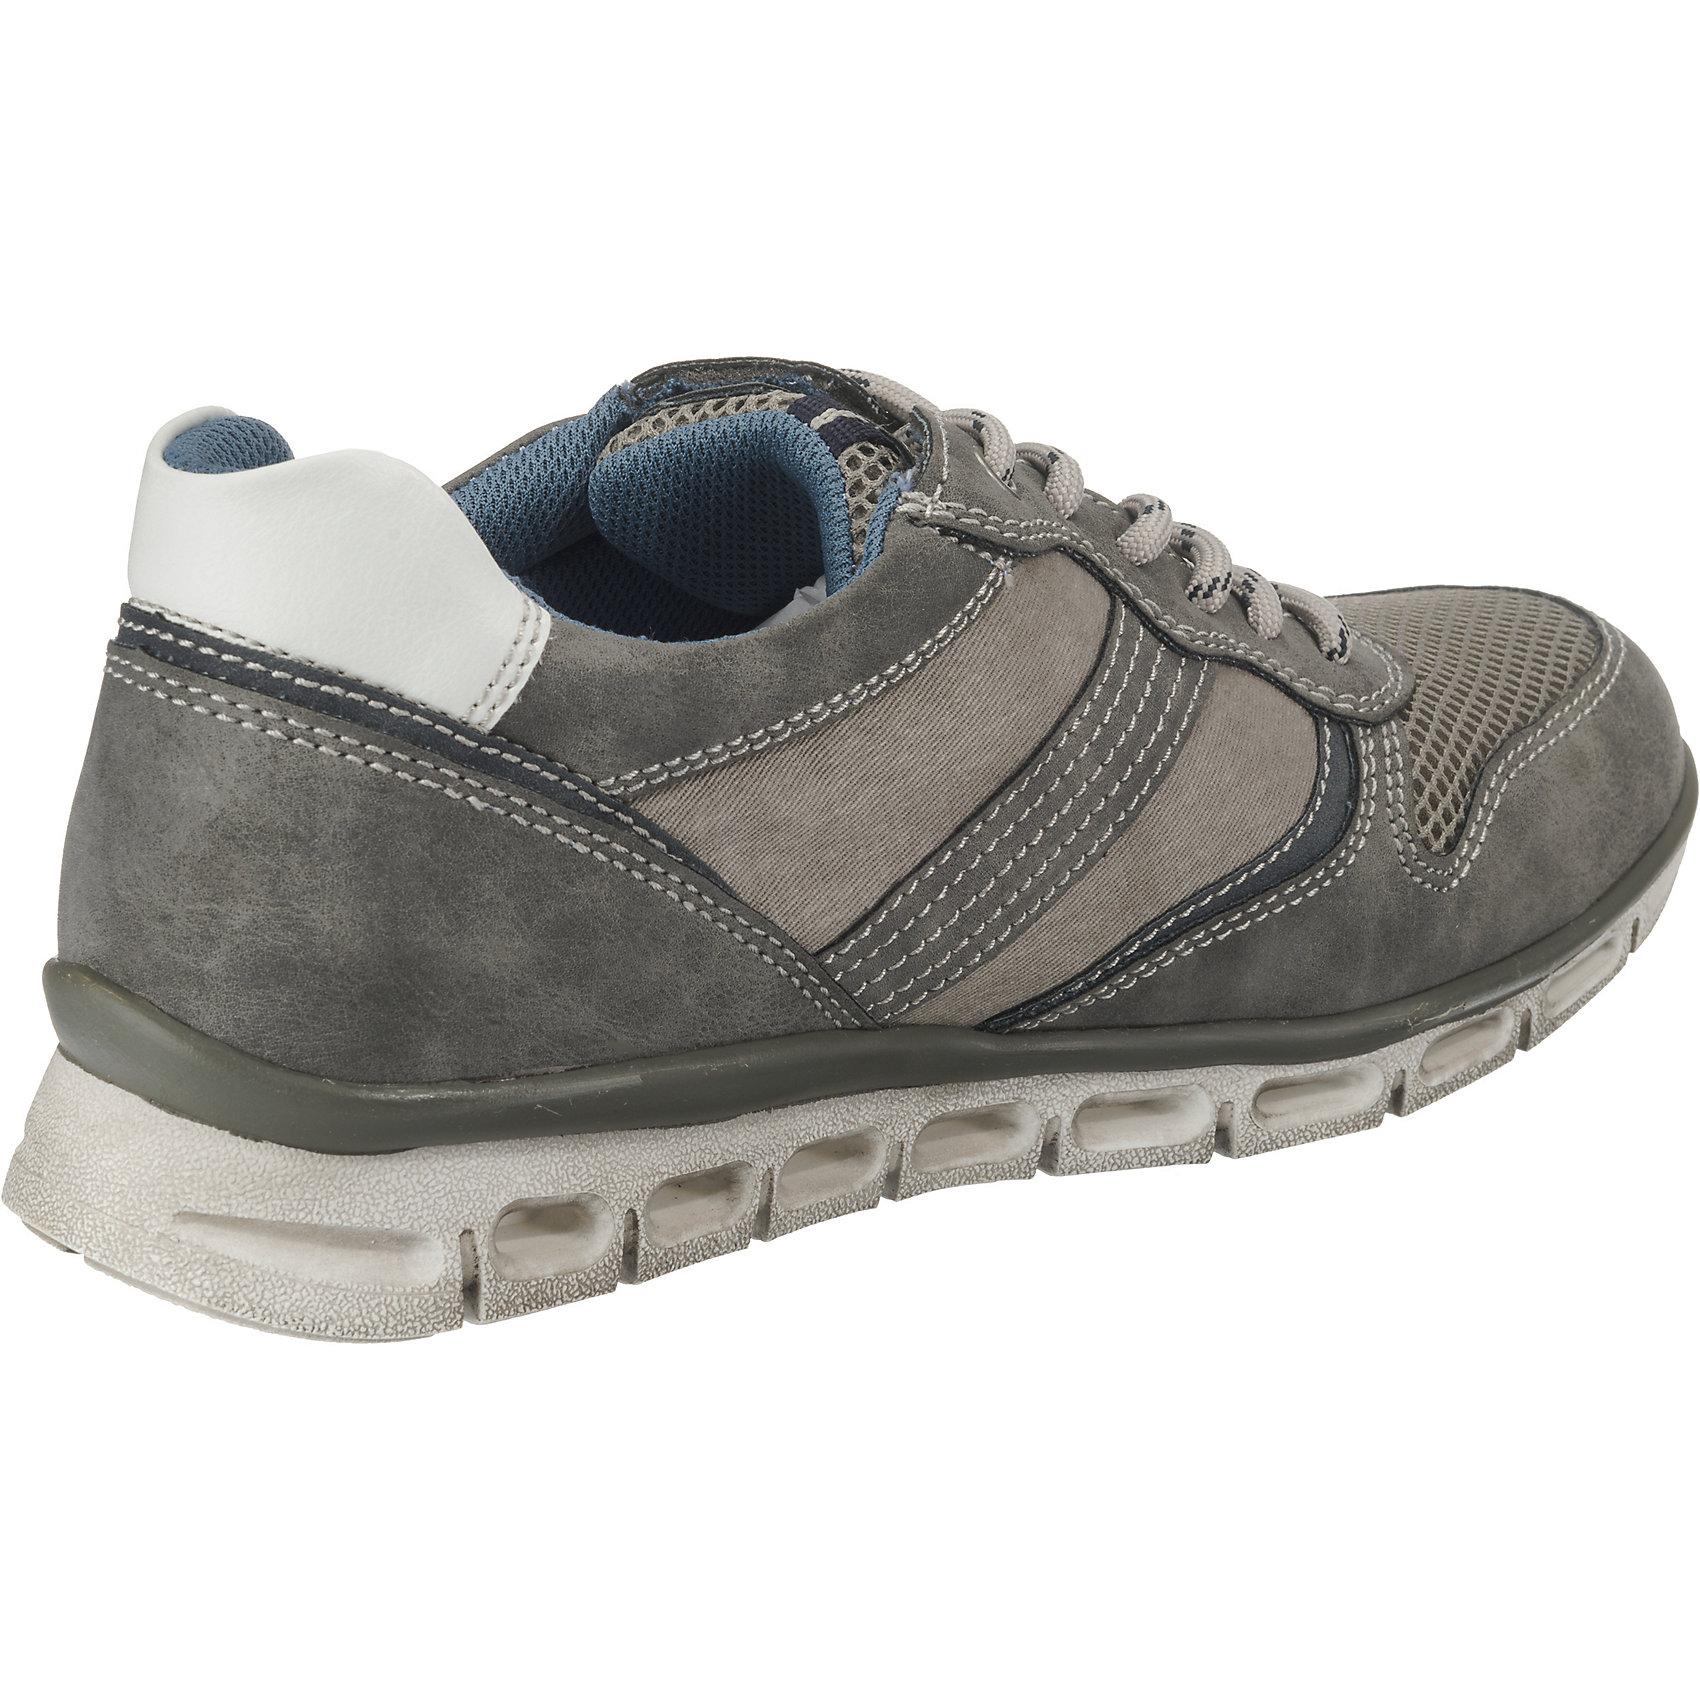 Neu Relife grau Komfort-Halbschuhe 8085470 für Herren grau Relife blau 8824b6